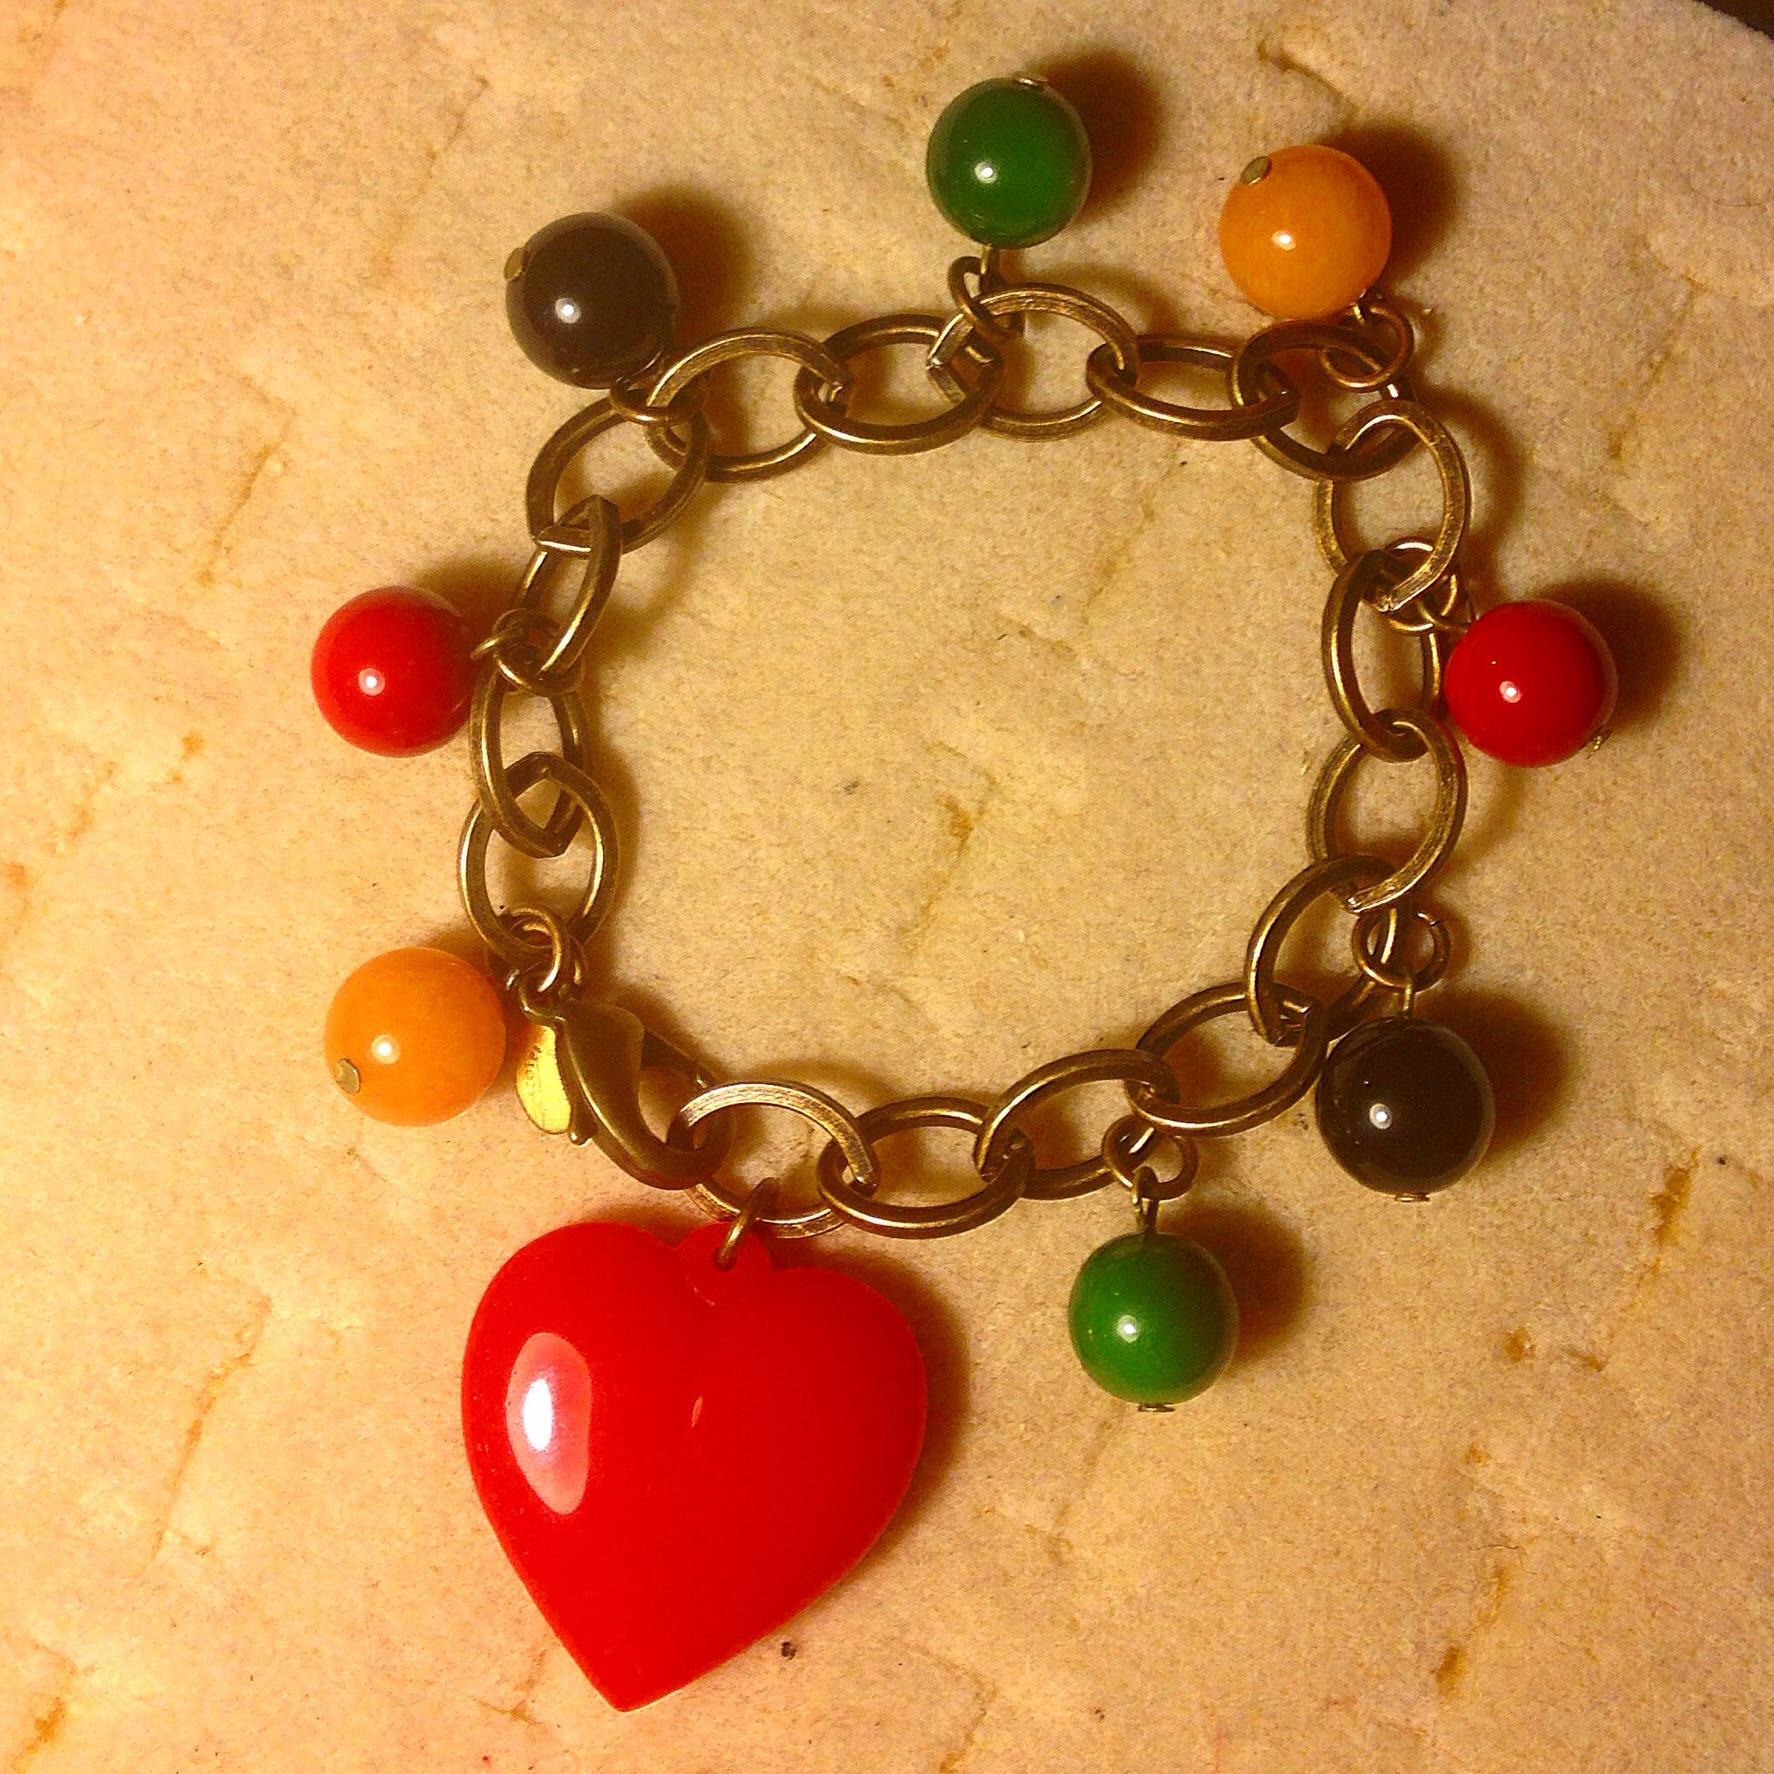 Charm bracelet! Very bakelite color theme! Very adjustable